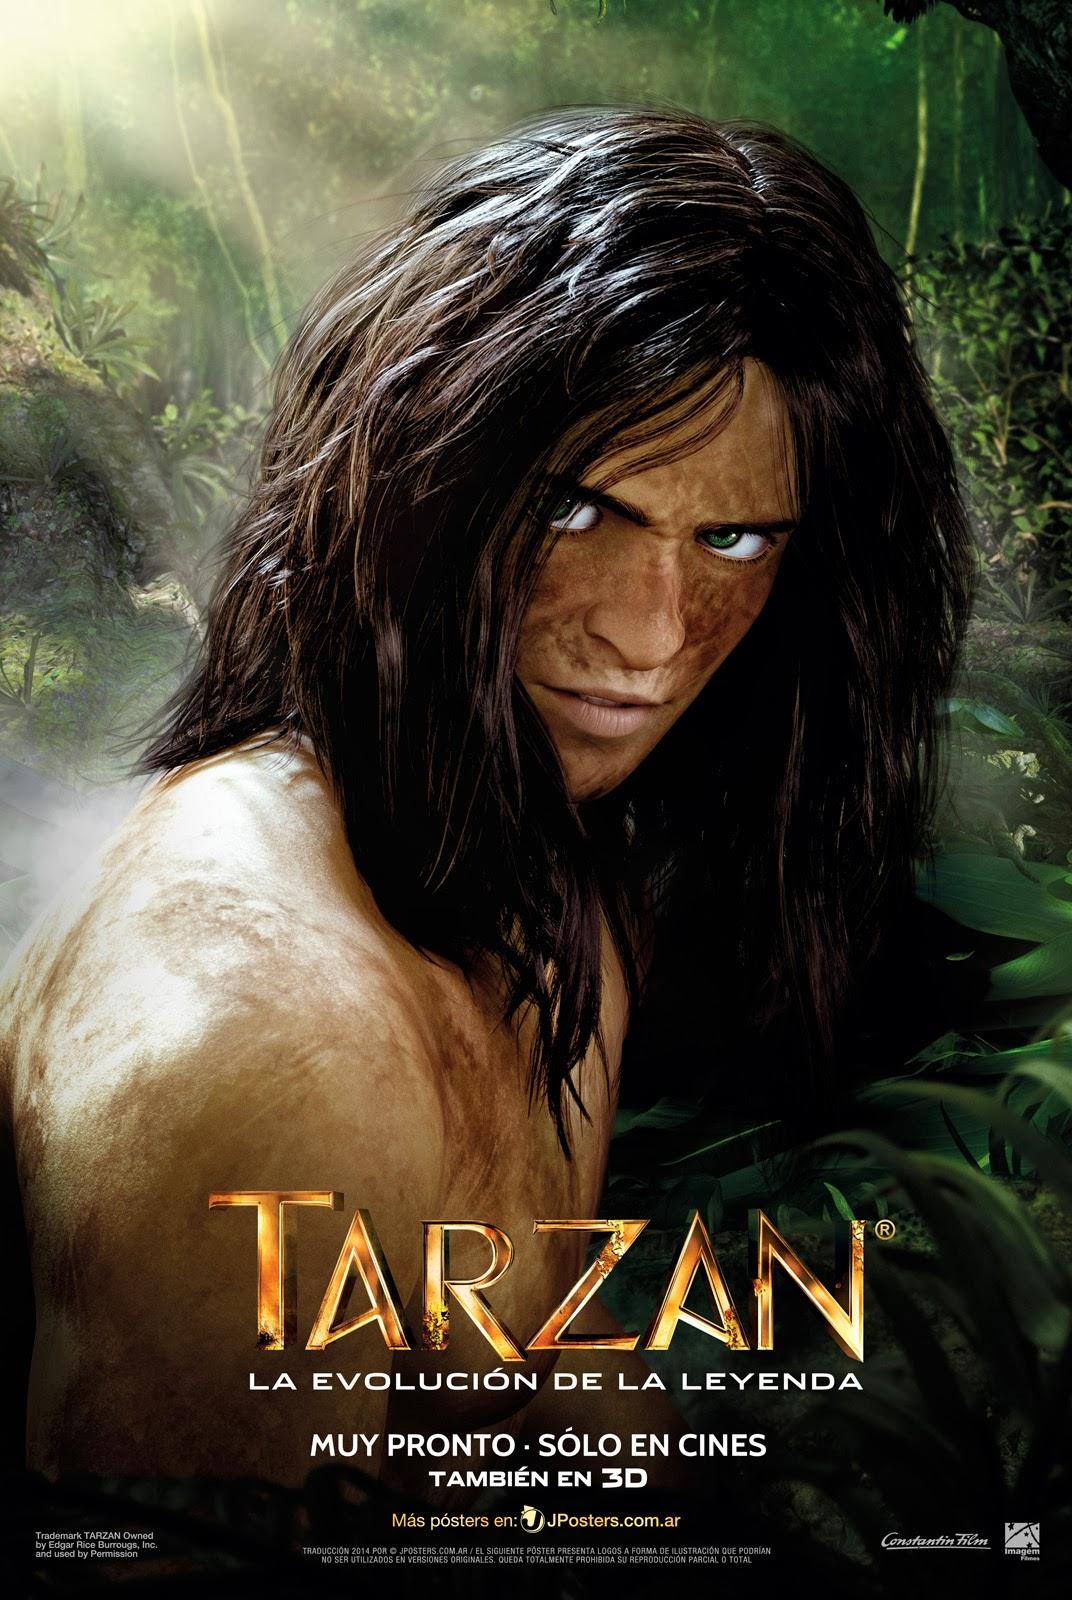 http://2.bp.blogspot.com/-EnSz2E6gBDk/Ux5sZPT9g3I/AAAAAAAAUms/XLm7SR0Lg5Q/s1600/Tarzan_Poster_Individual_Latino_a_JPosters.jpg